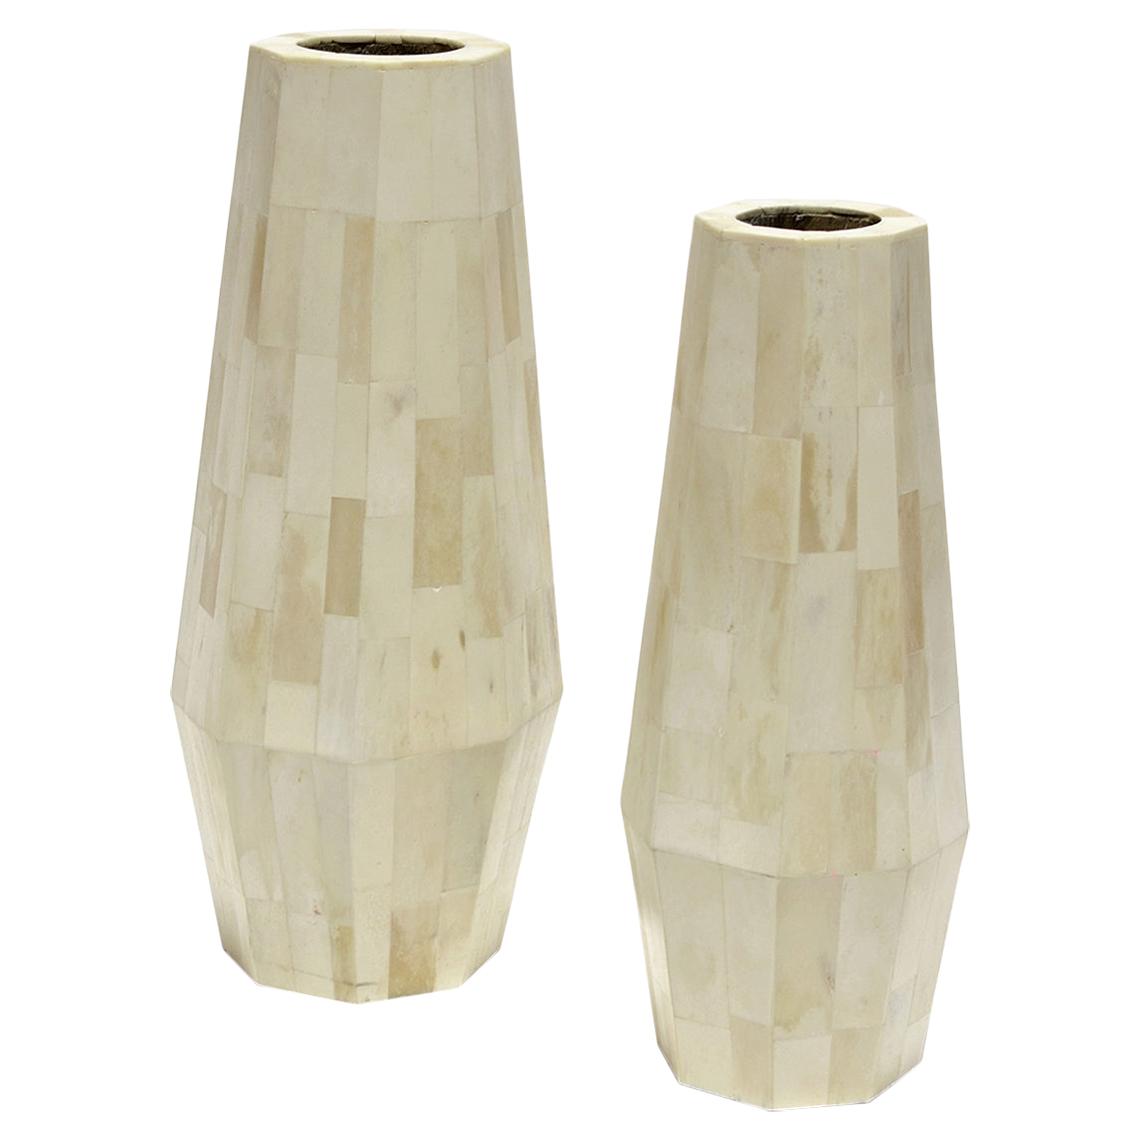 Rameel Global Bazaar Natural Inlaid Bone Vase - Pair